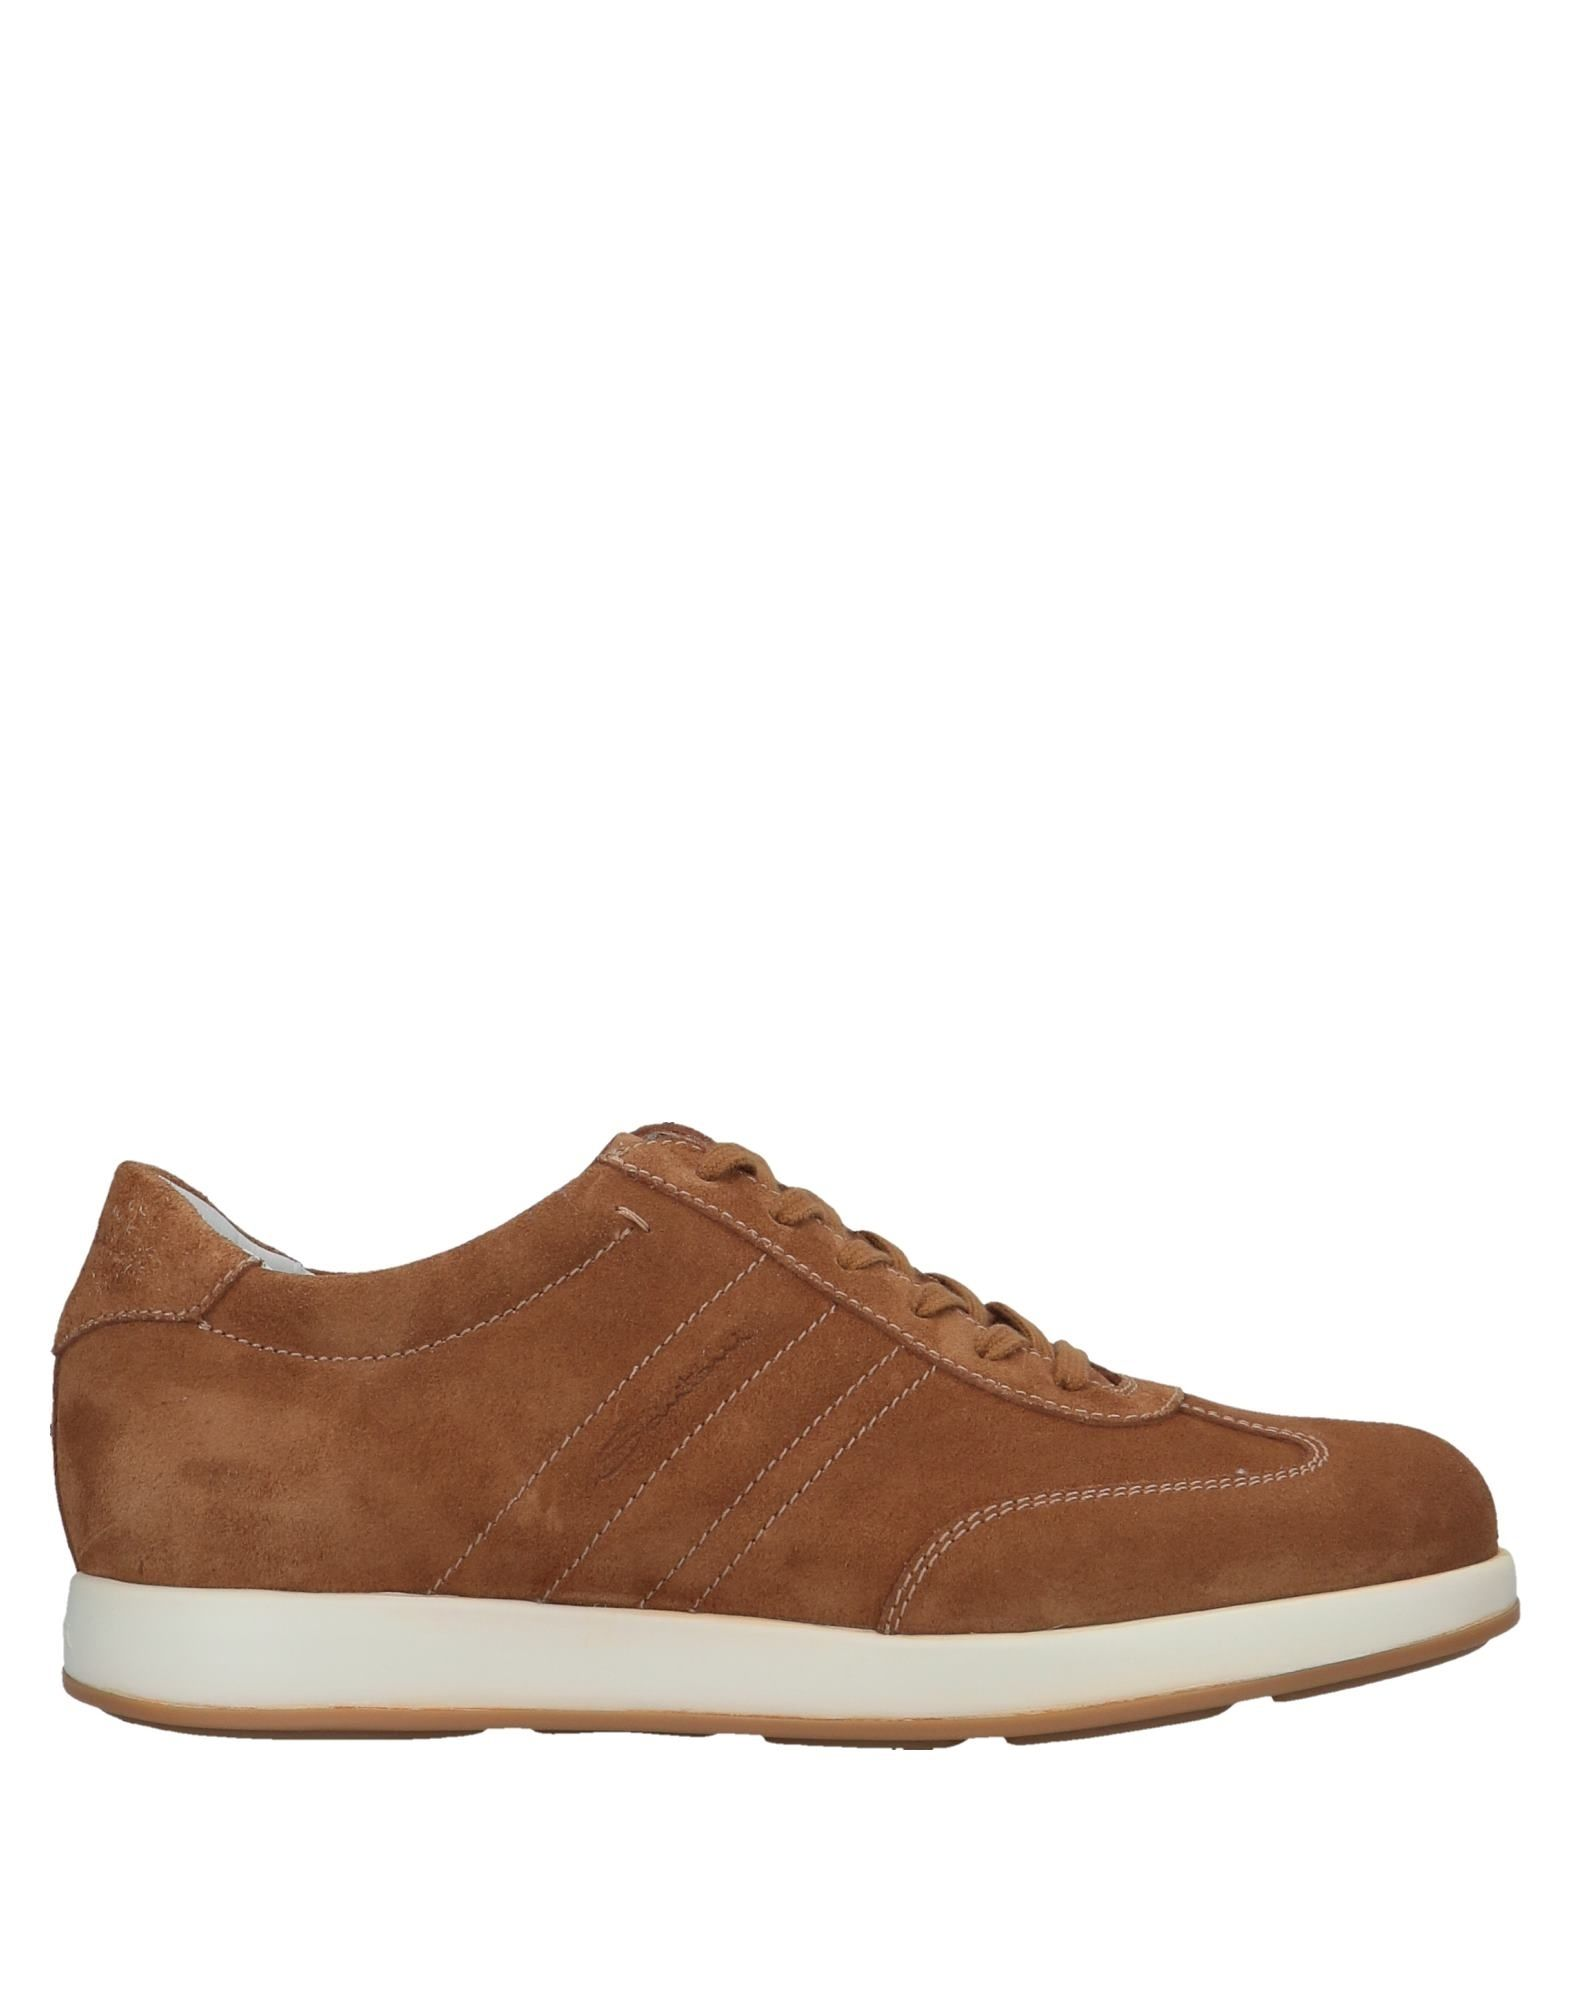 Santoni 11541548MJ Sneakers Herren  11541548MJ Santoni Gute Qualität beliebte Schuhe 60c890